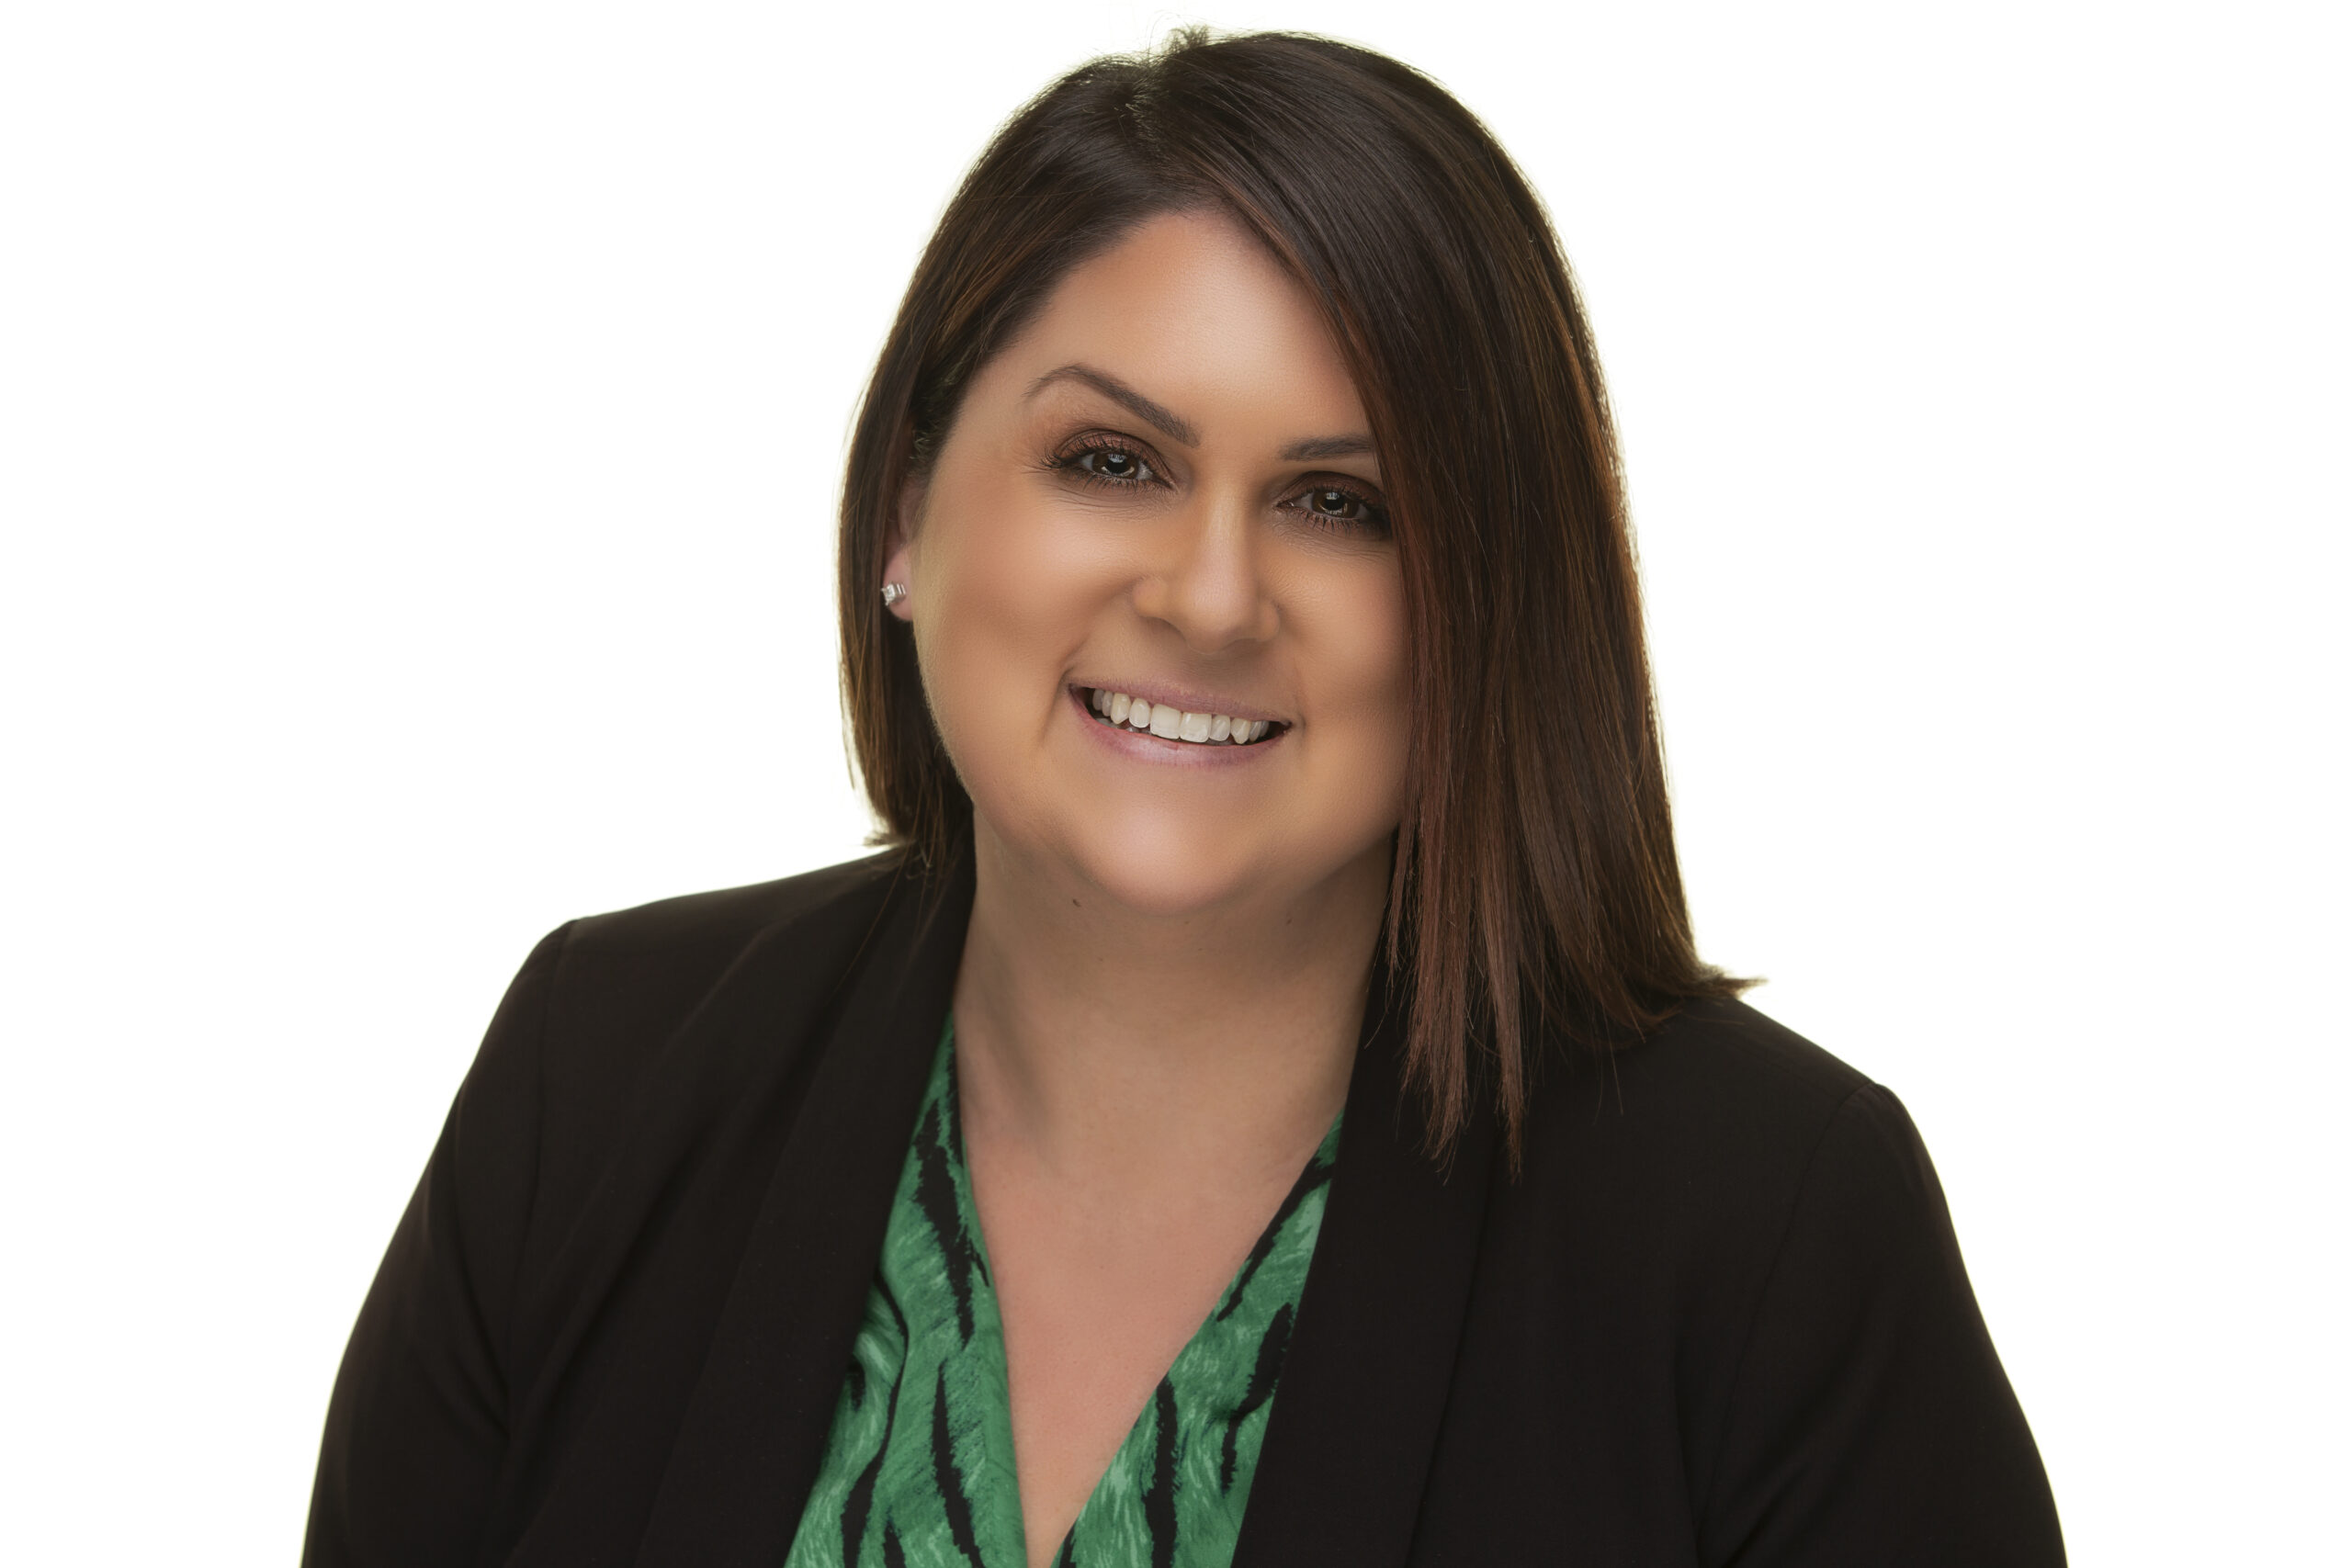 Nicole Garza